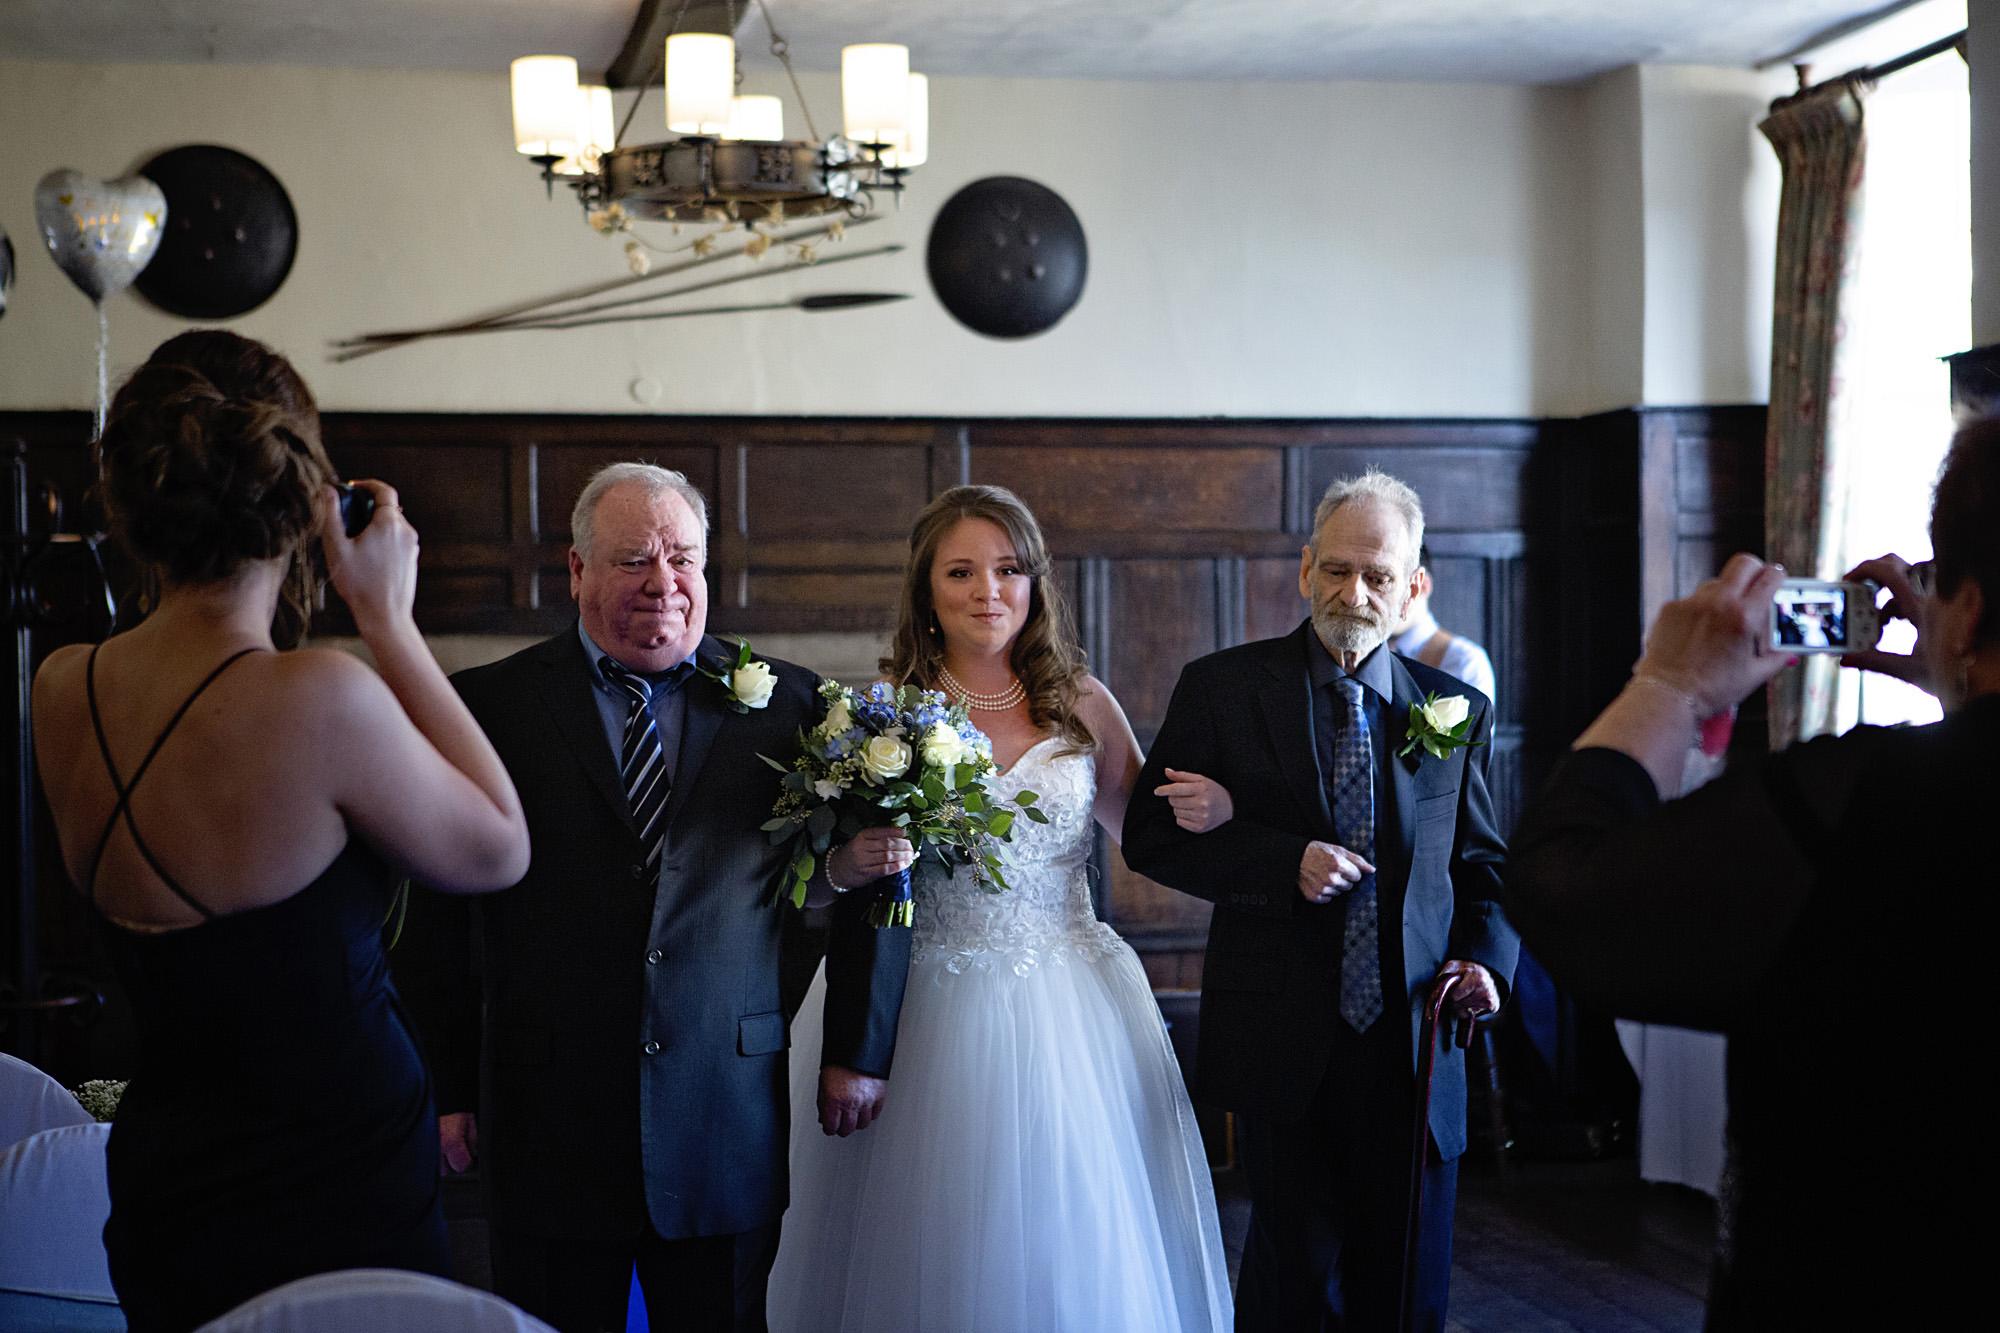 wedding-photos-talbot-hotel-oundle (11).jpg